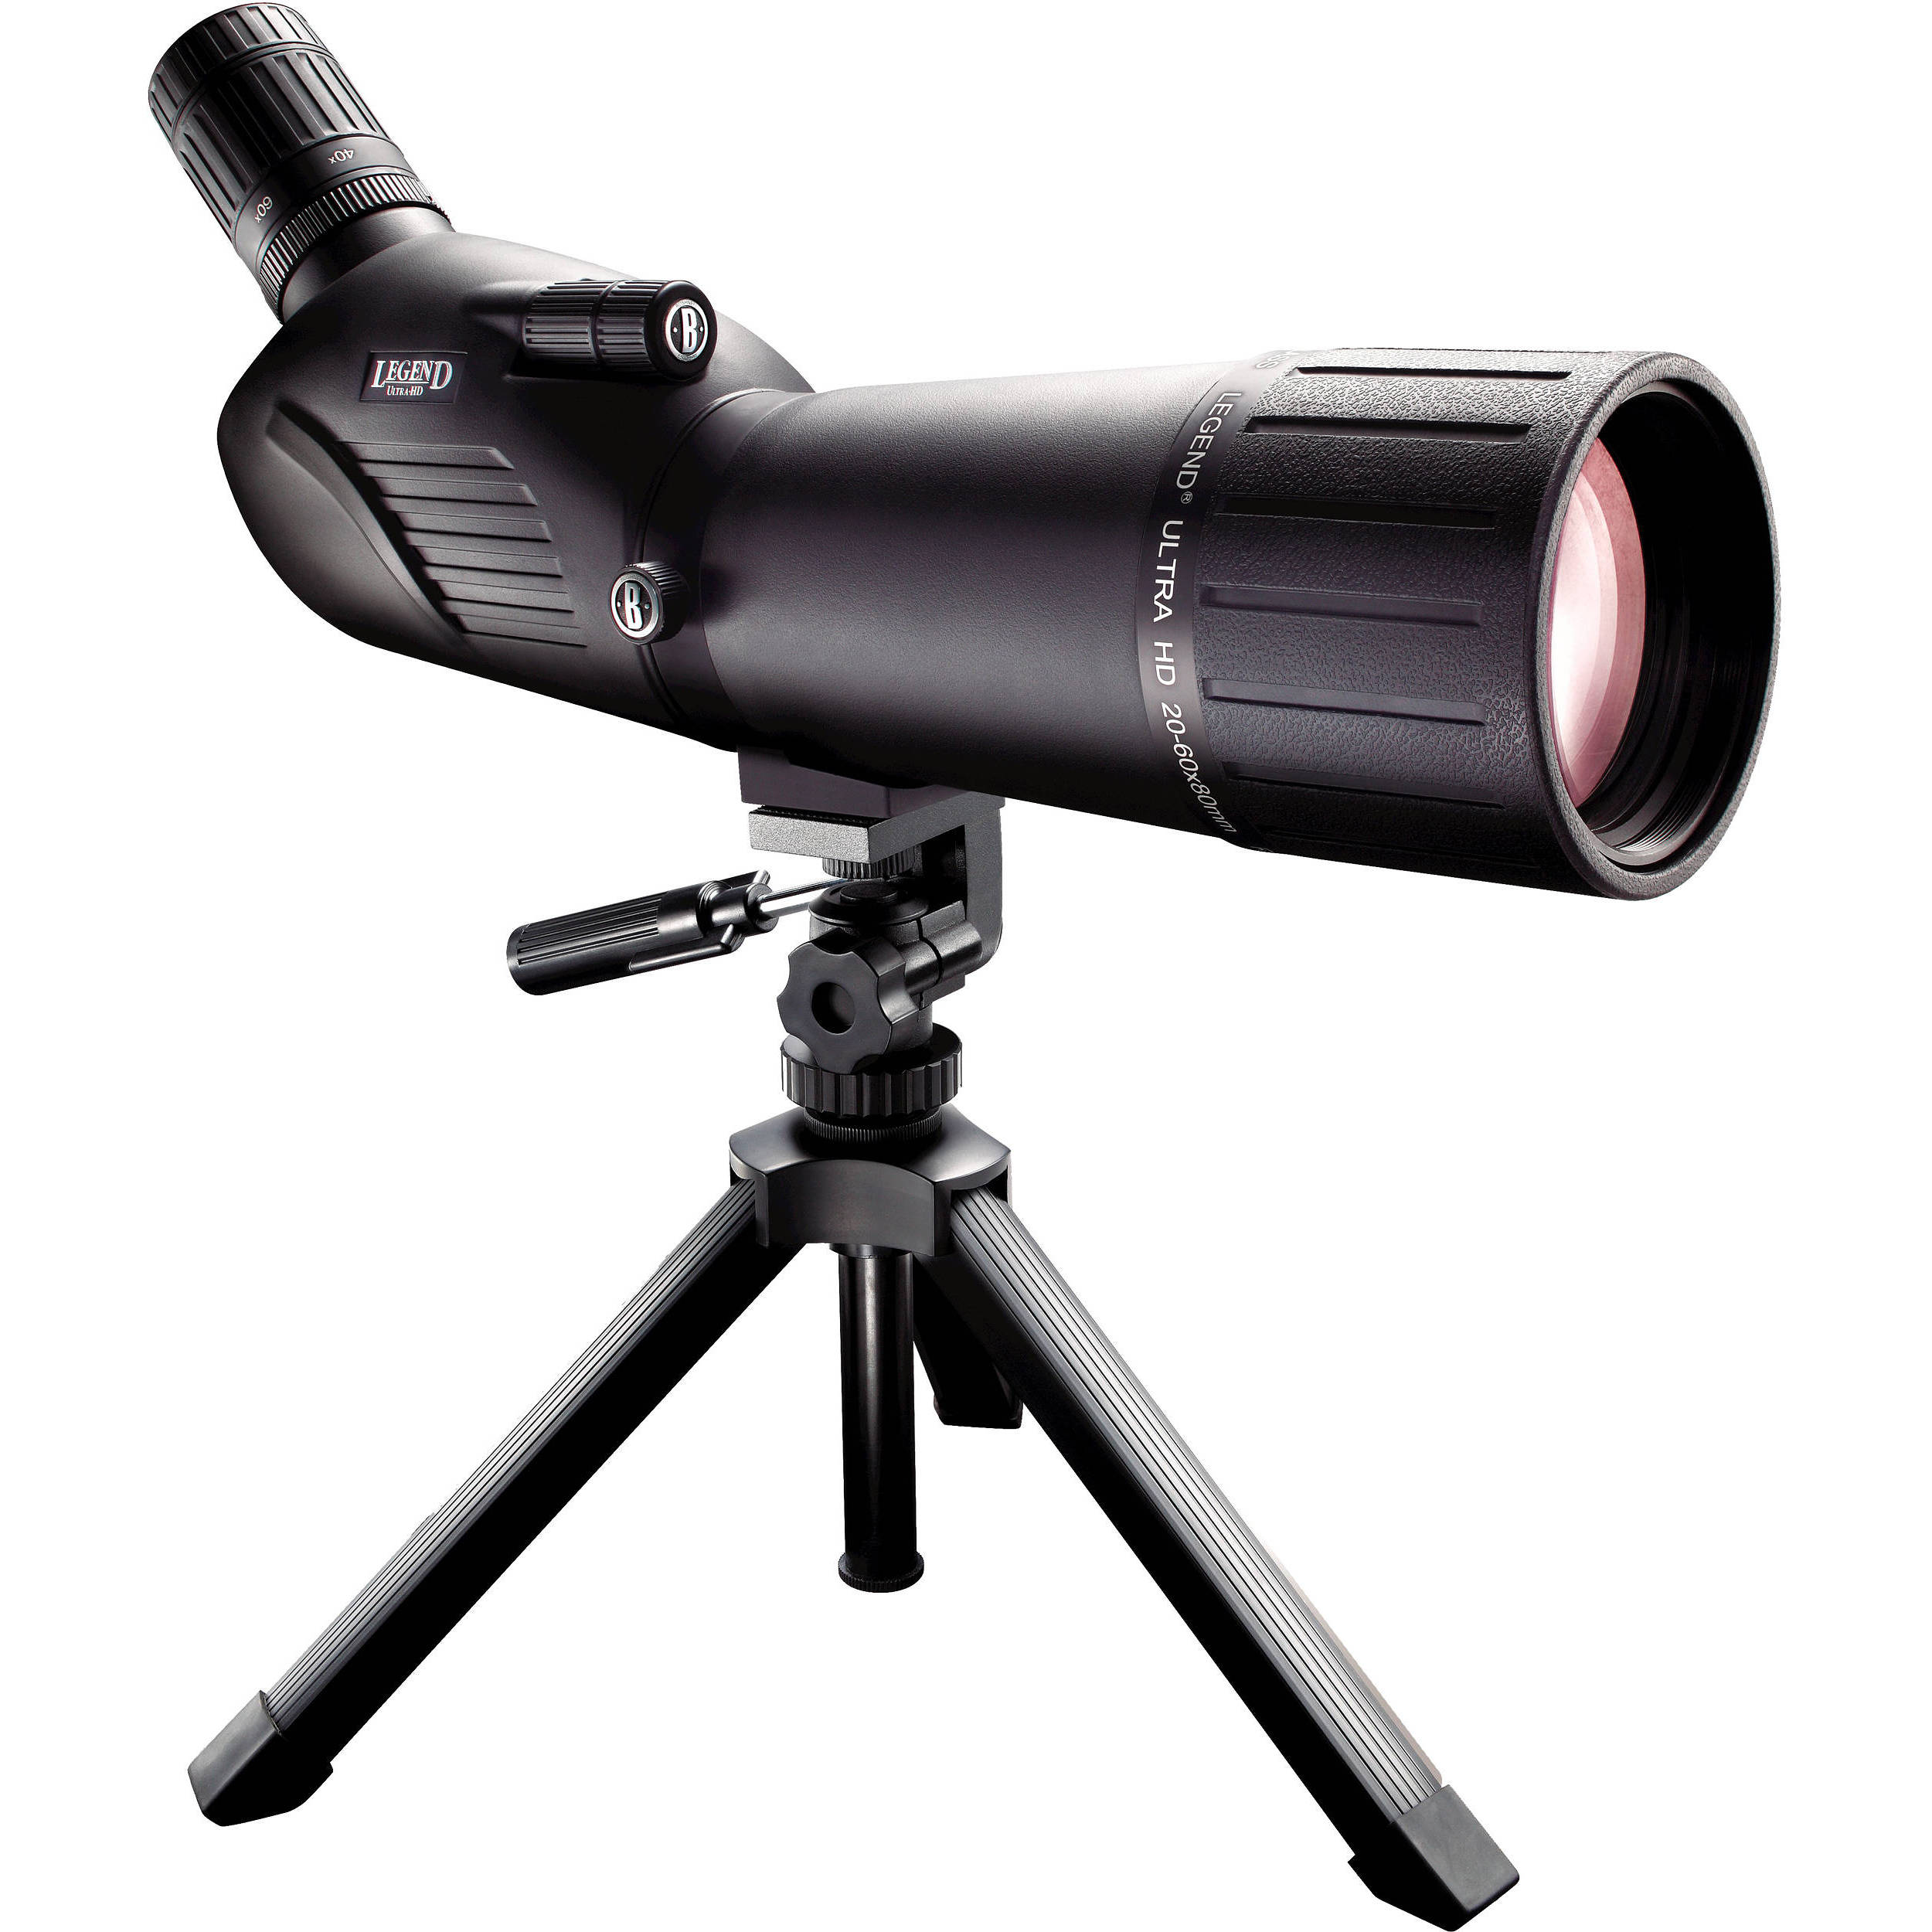 Зрительная труба Bushnell Legend Ultra HD 20-60x80